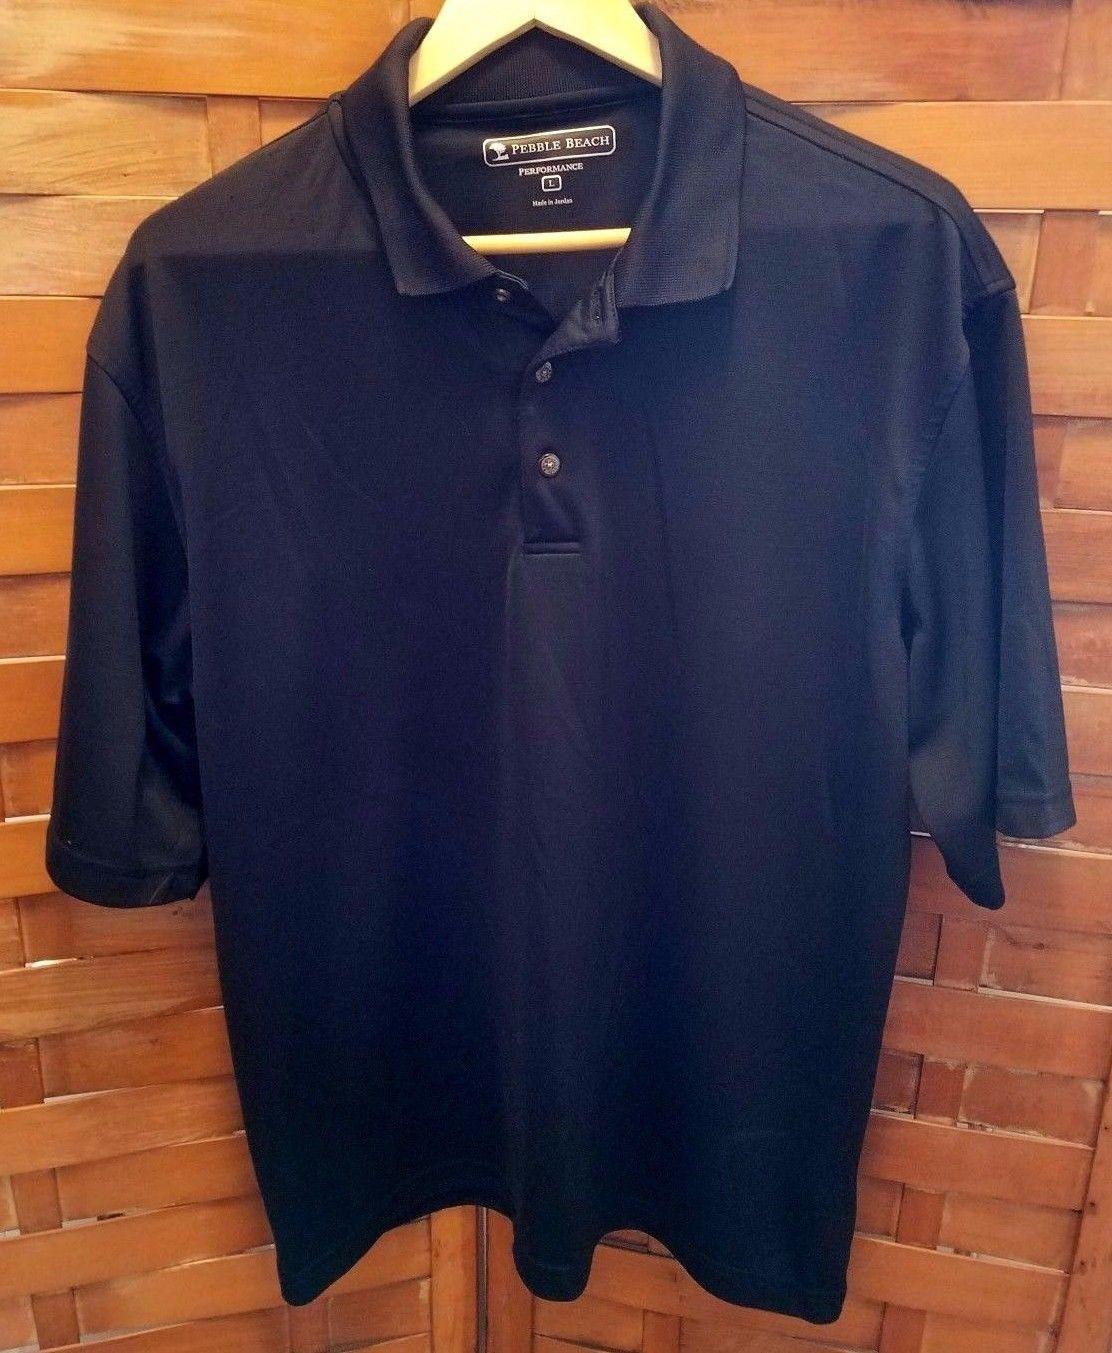 Pebble beach performance polo golf shirt black short for Pebble beach performance golf shirt